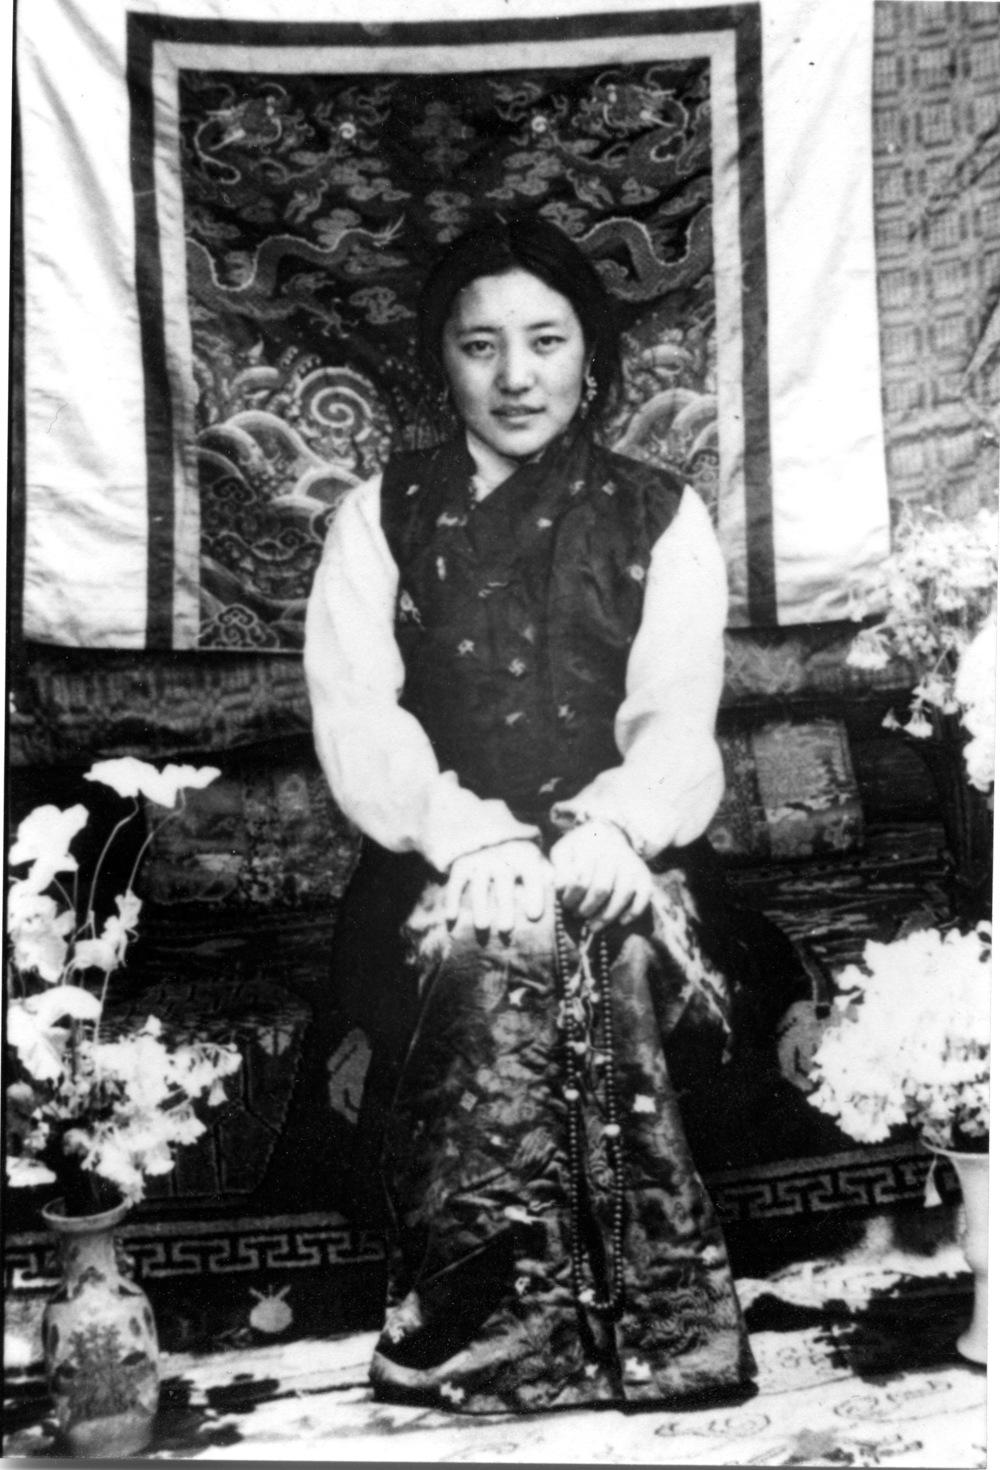 Khandro-la in Lhasa, 1965